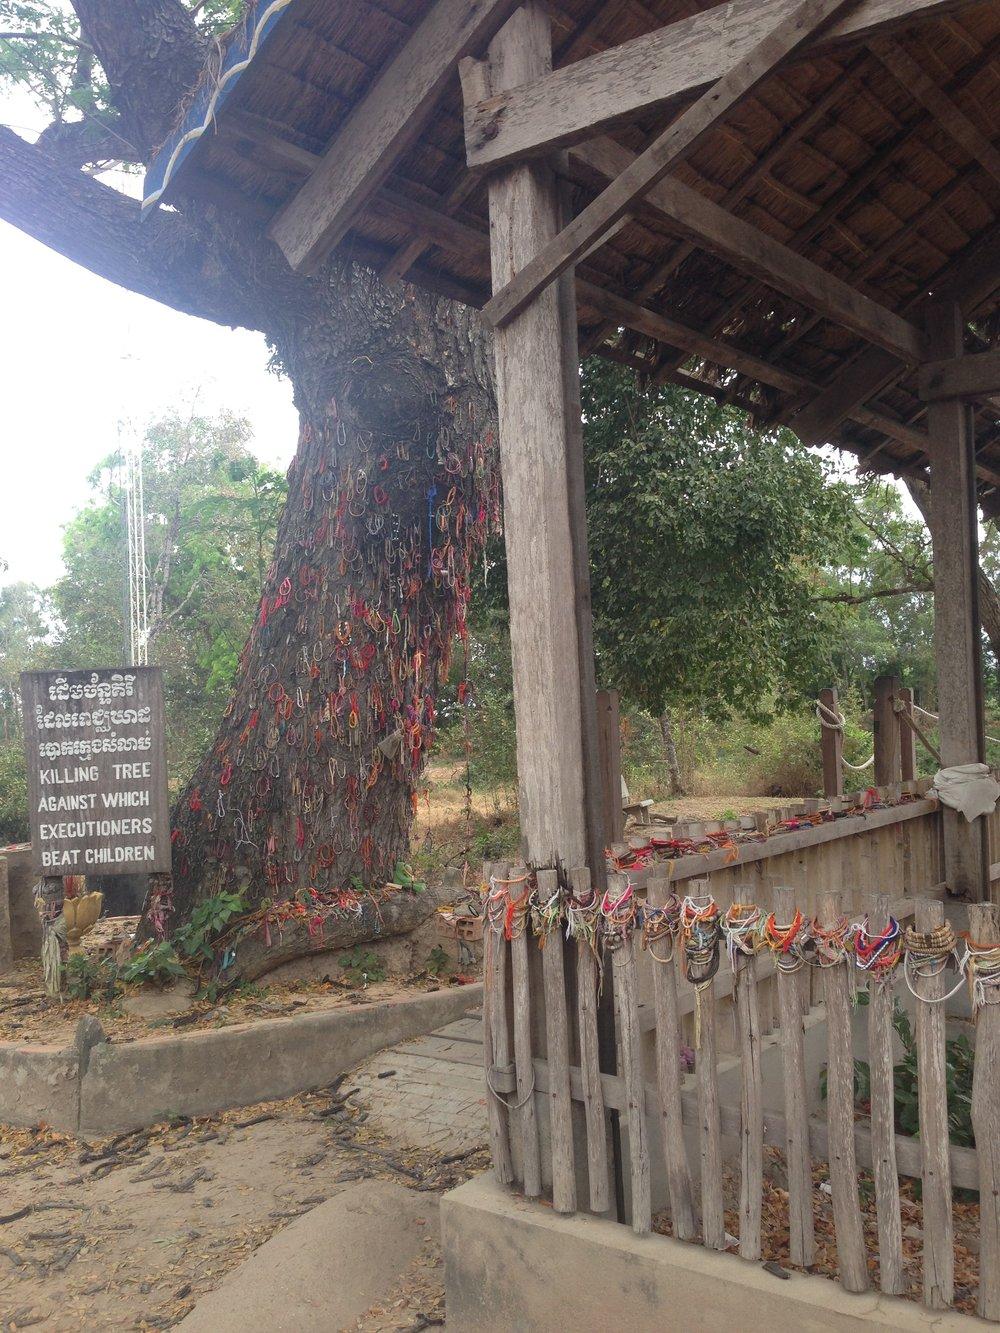 Killing Tree next to mass grave